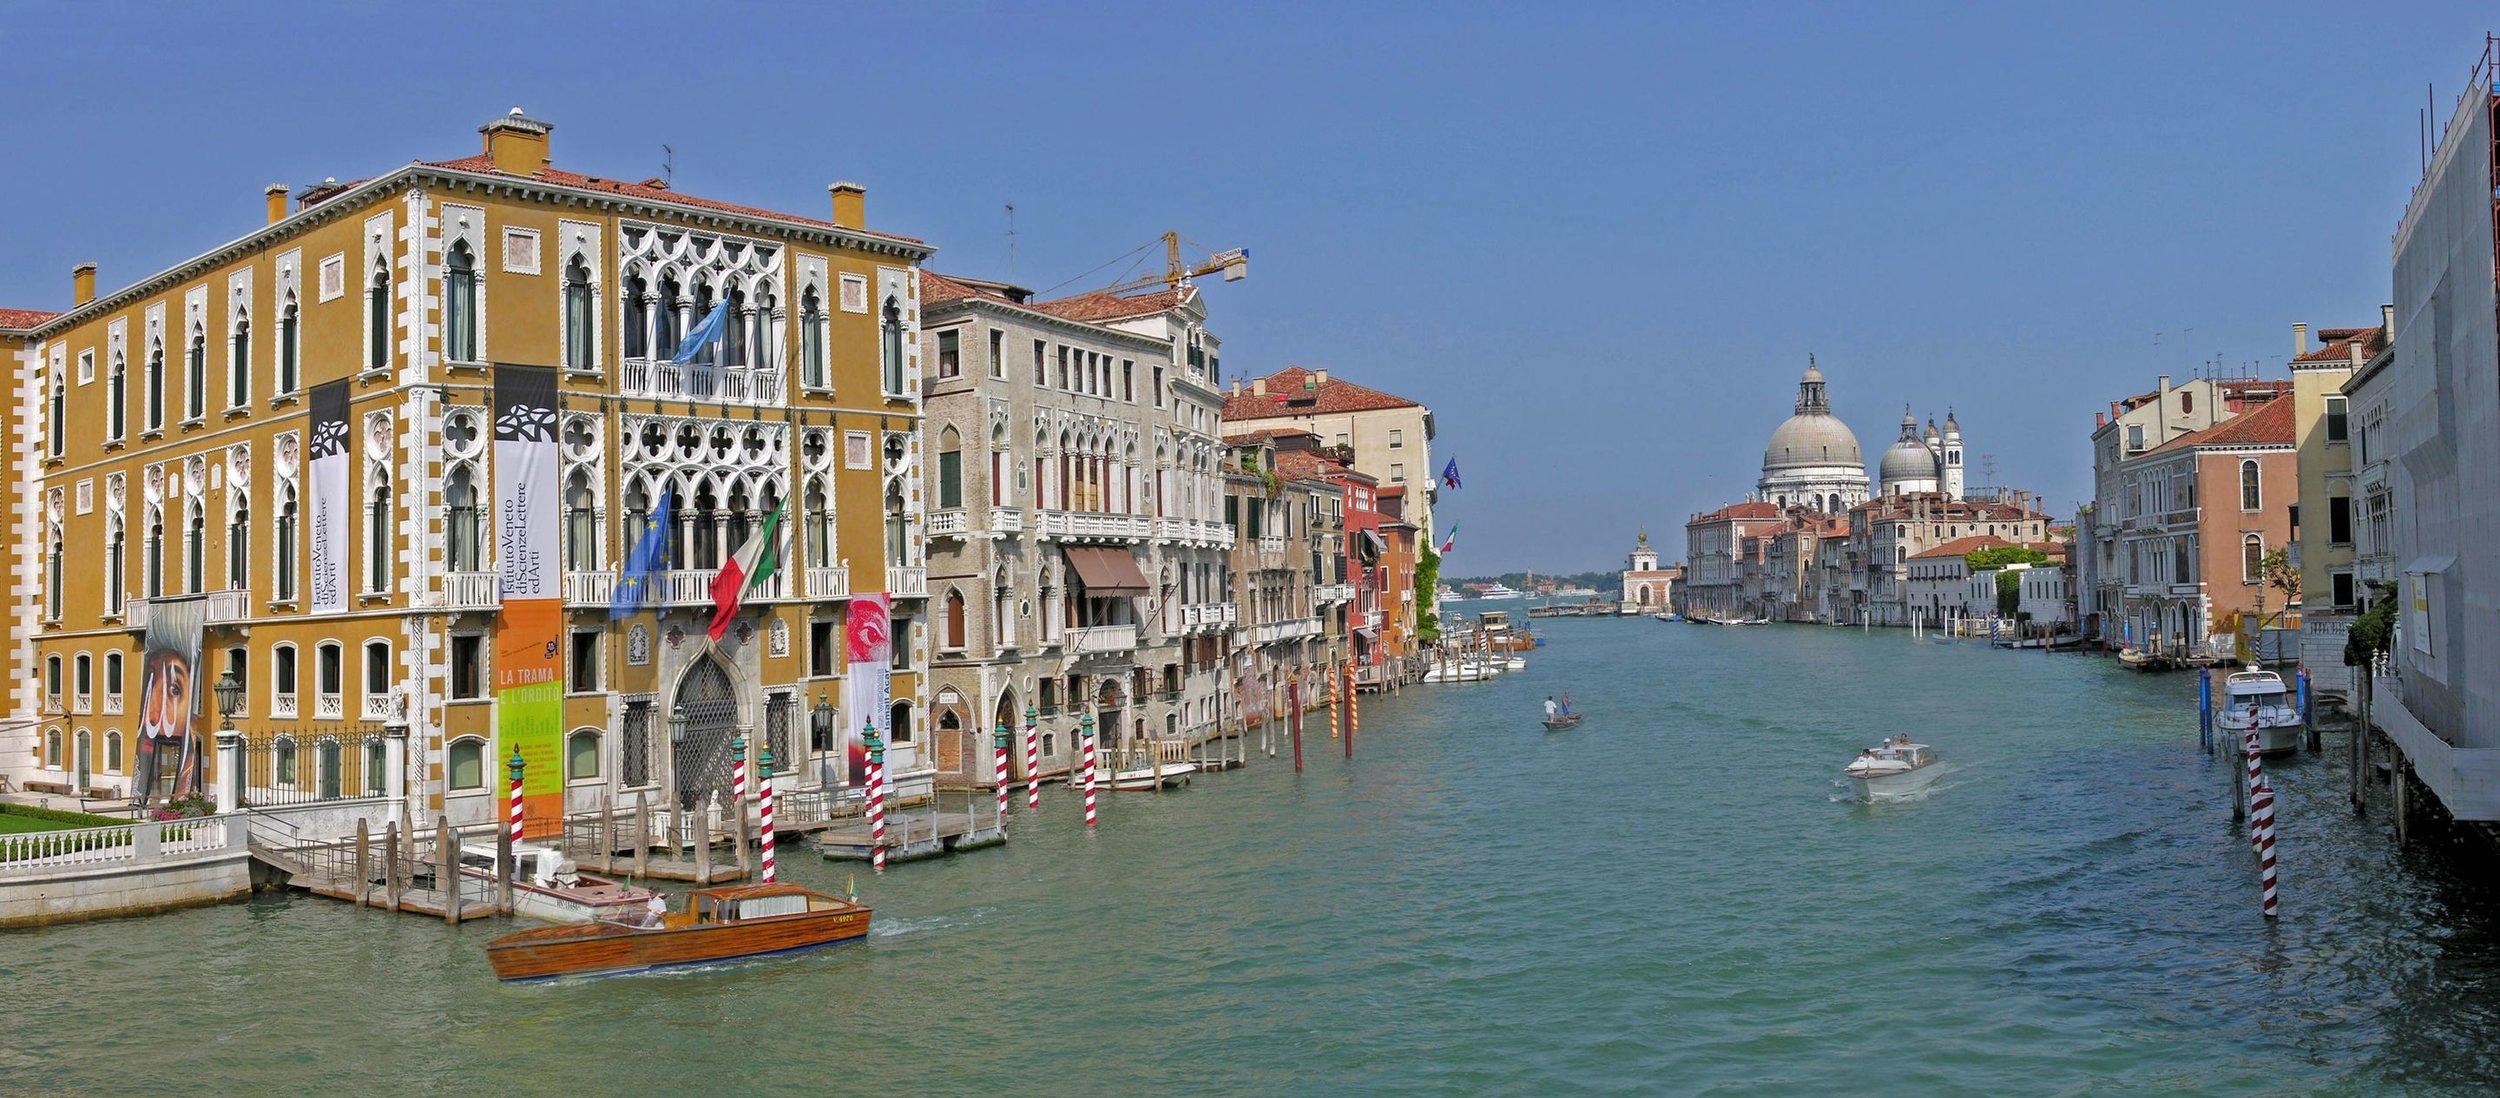 VeniceCanals_2.jpg